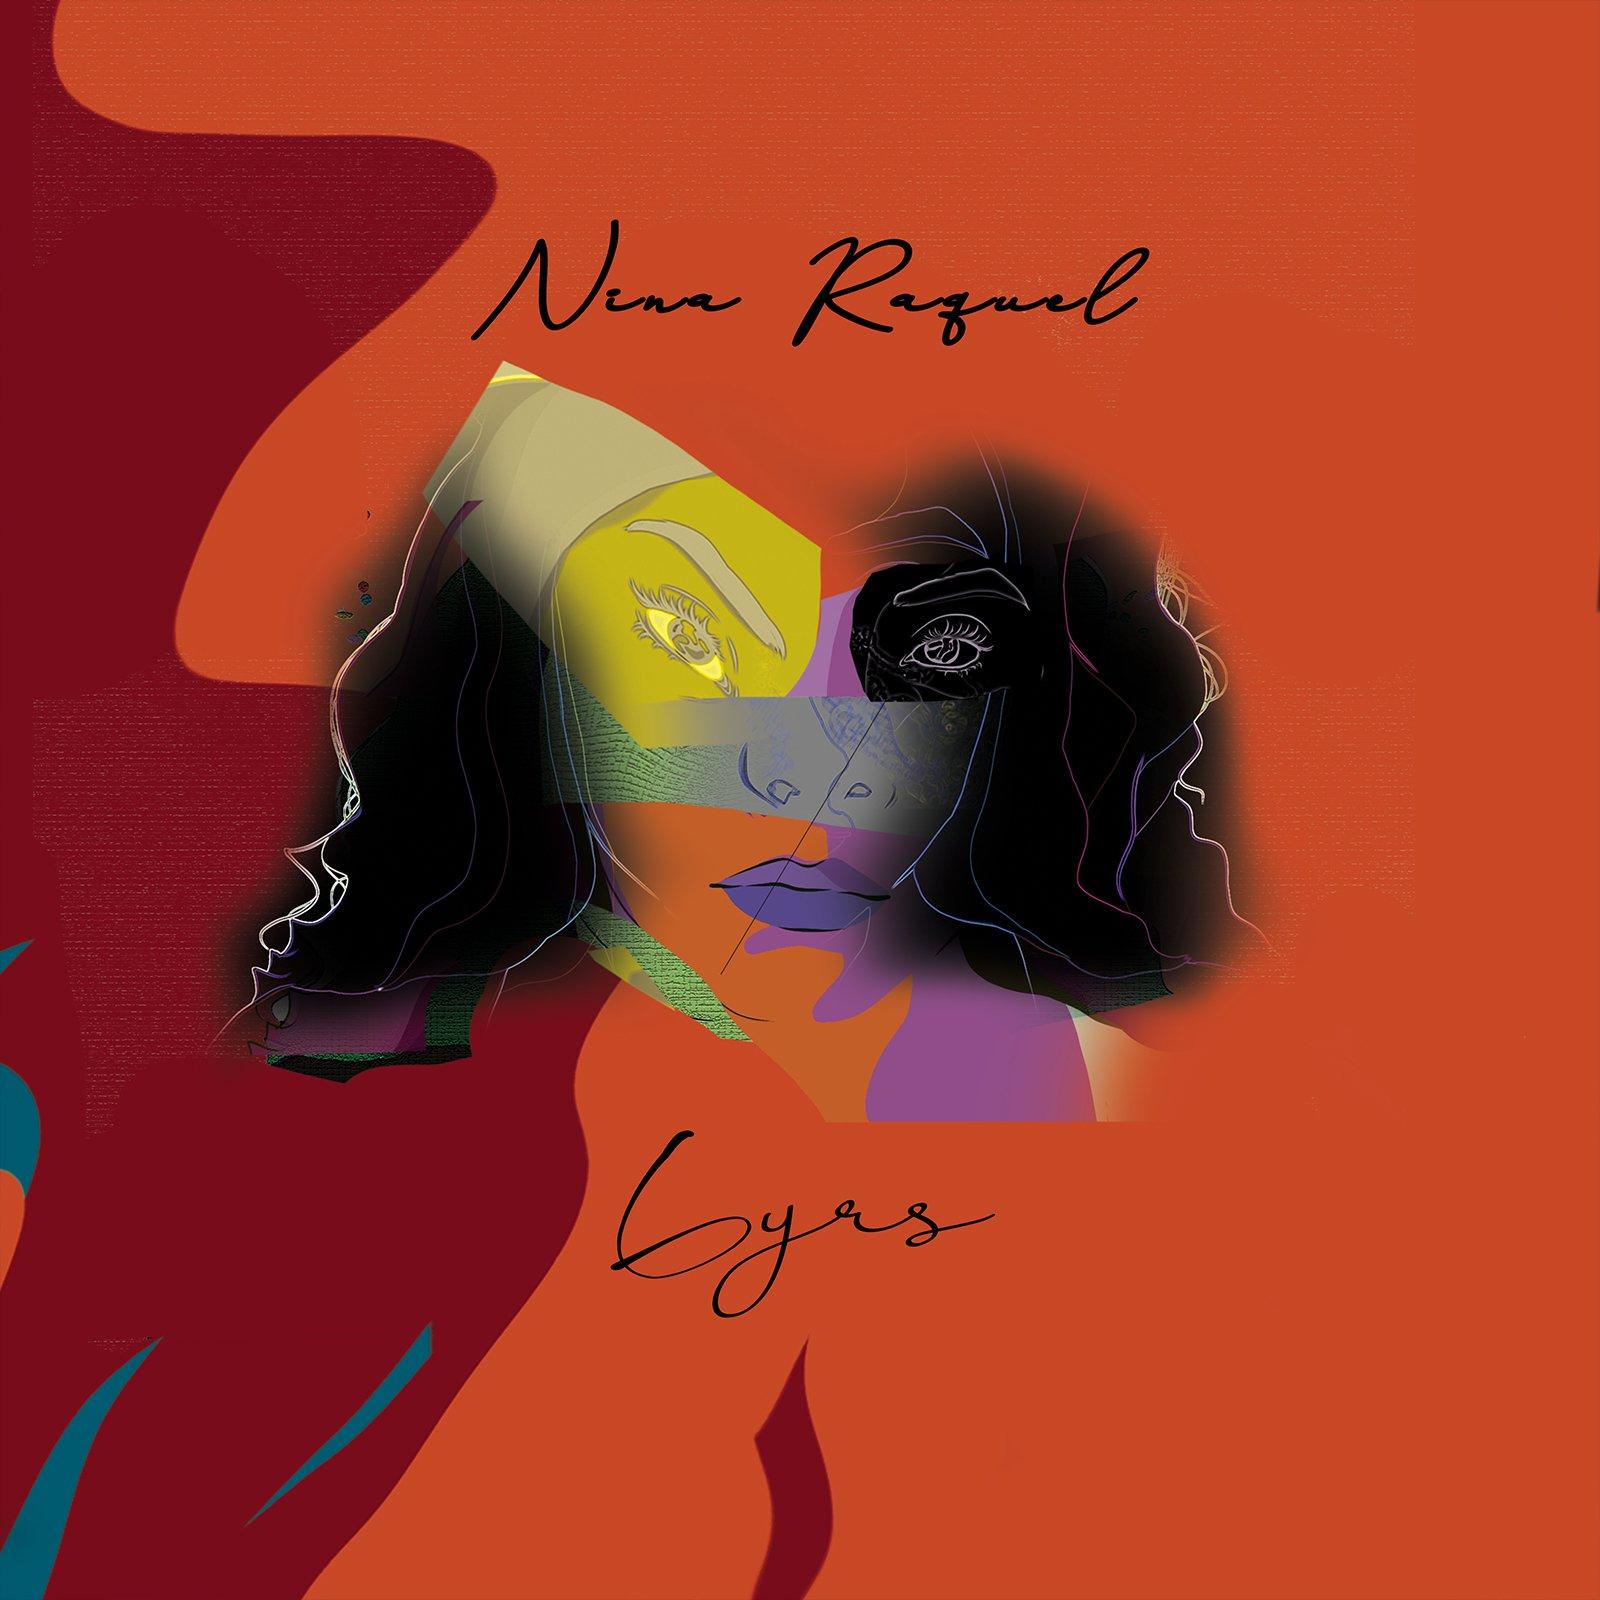 Nina Raquel – 6yrs